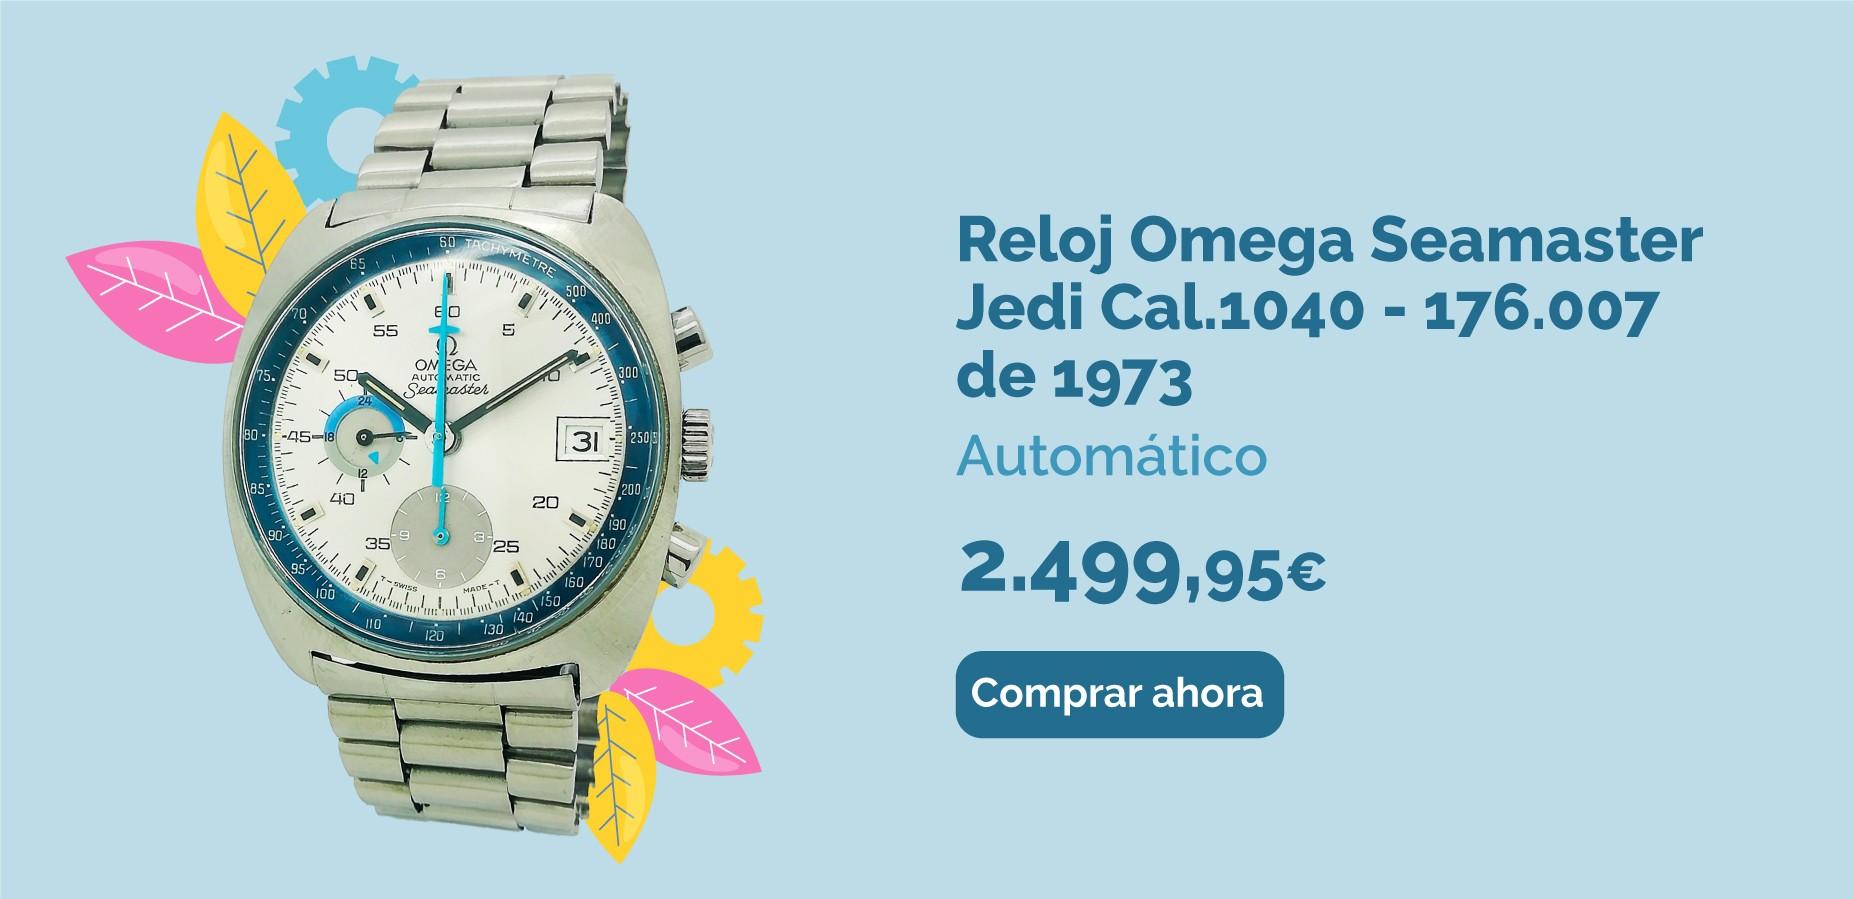 Reloj Automático Omega Seamaster Jedi Cal.1040 - 176.007 de 1973 - Raro de segunda mano